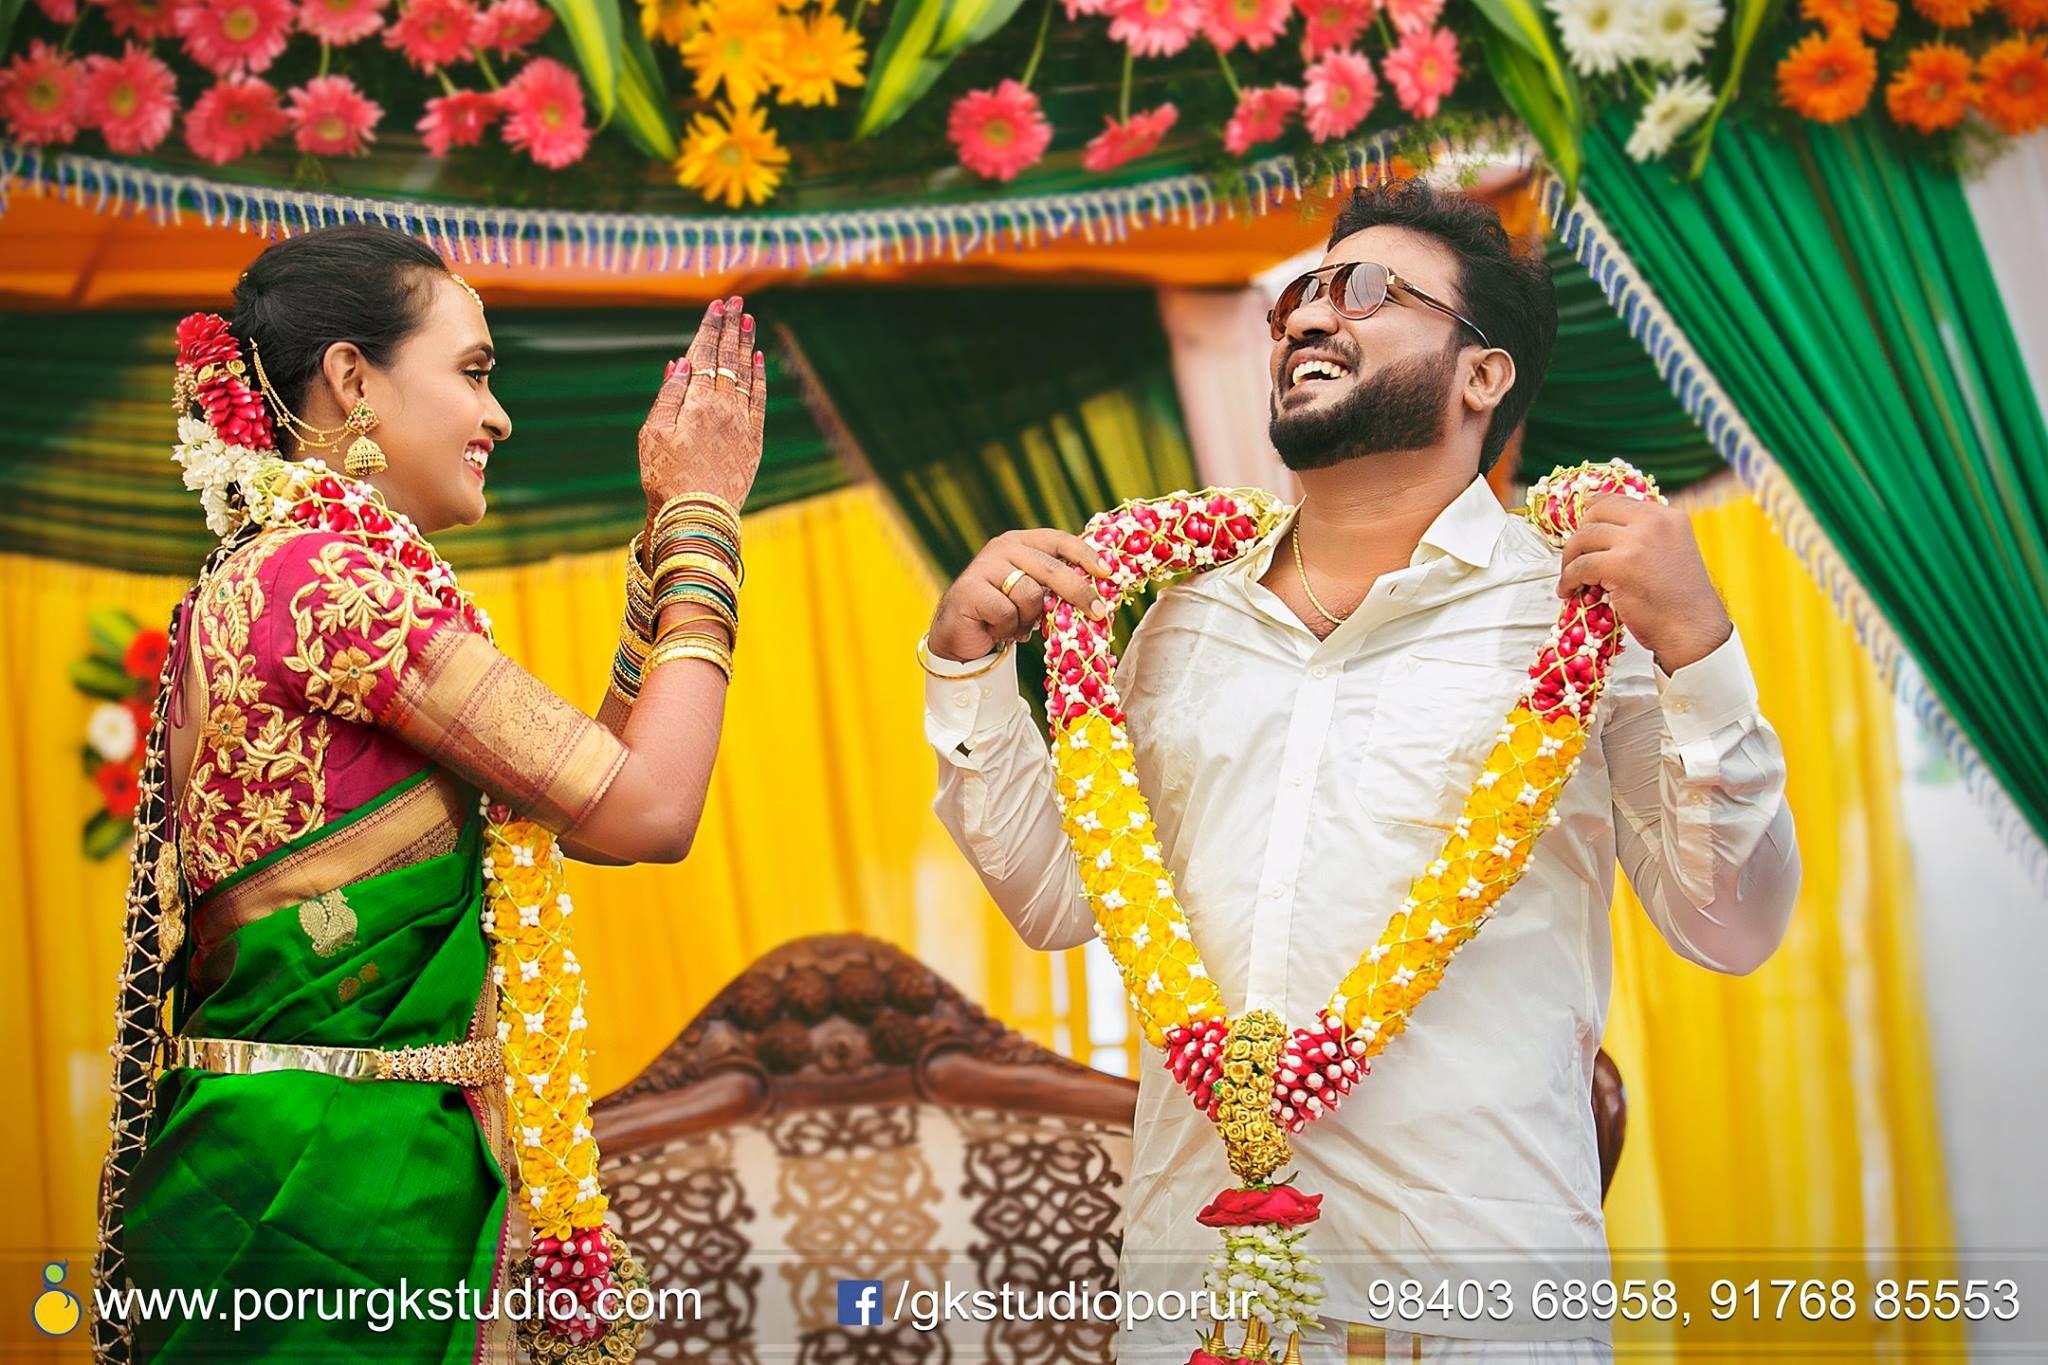 Porurgkstudio Porurgkstudio Tamilnadu Chennai Wedding Photographers Indian Wedding Photography Poses Wedding Couple Poses Photography Wedding Photos Poses